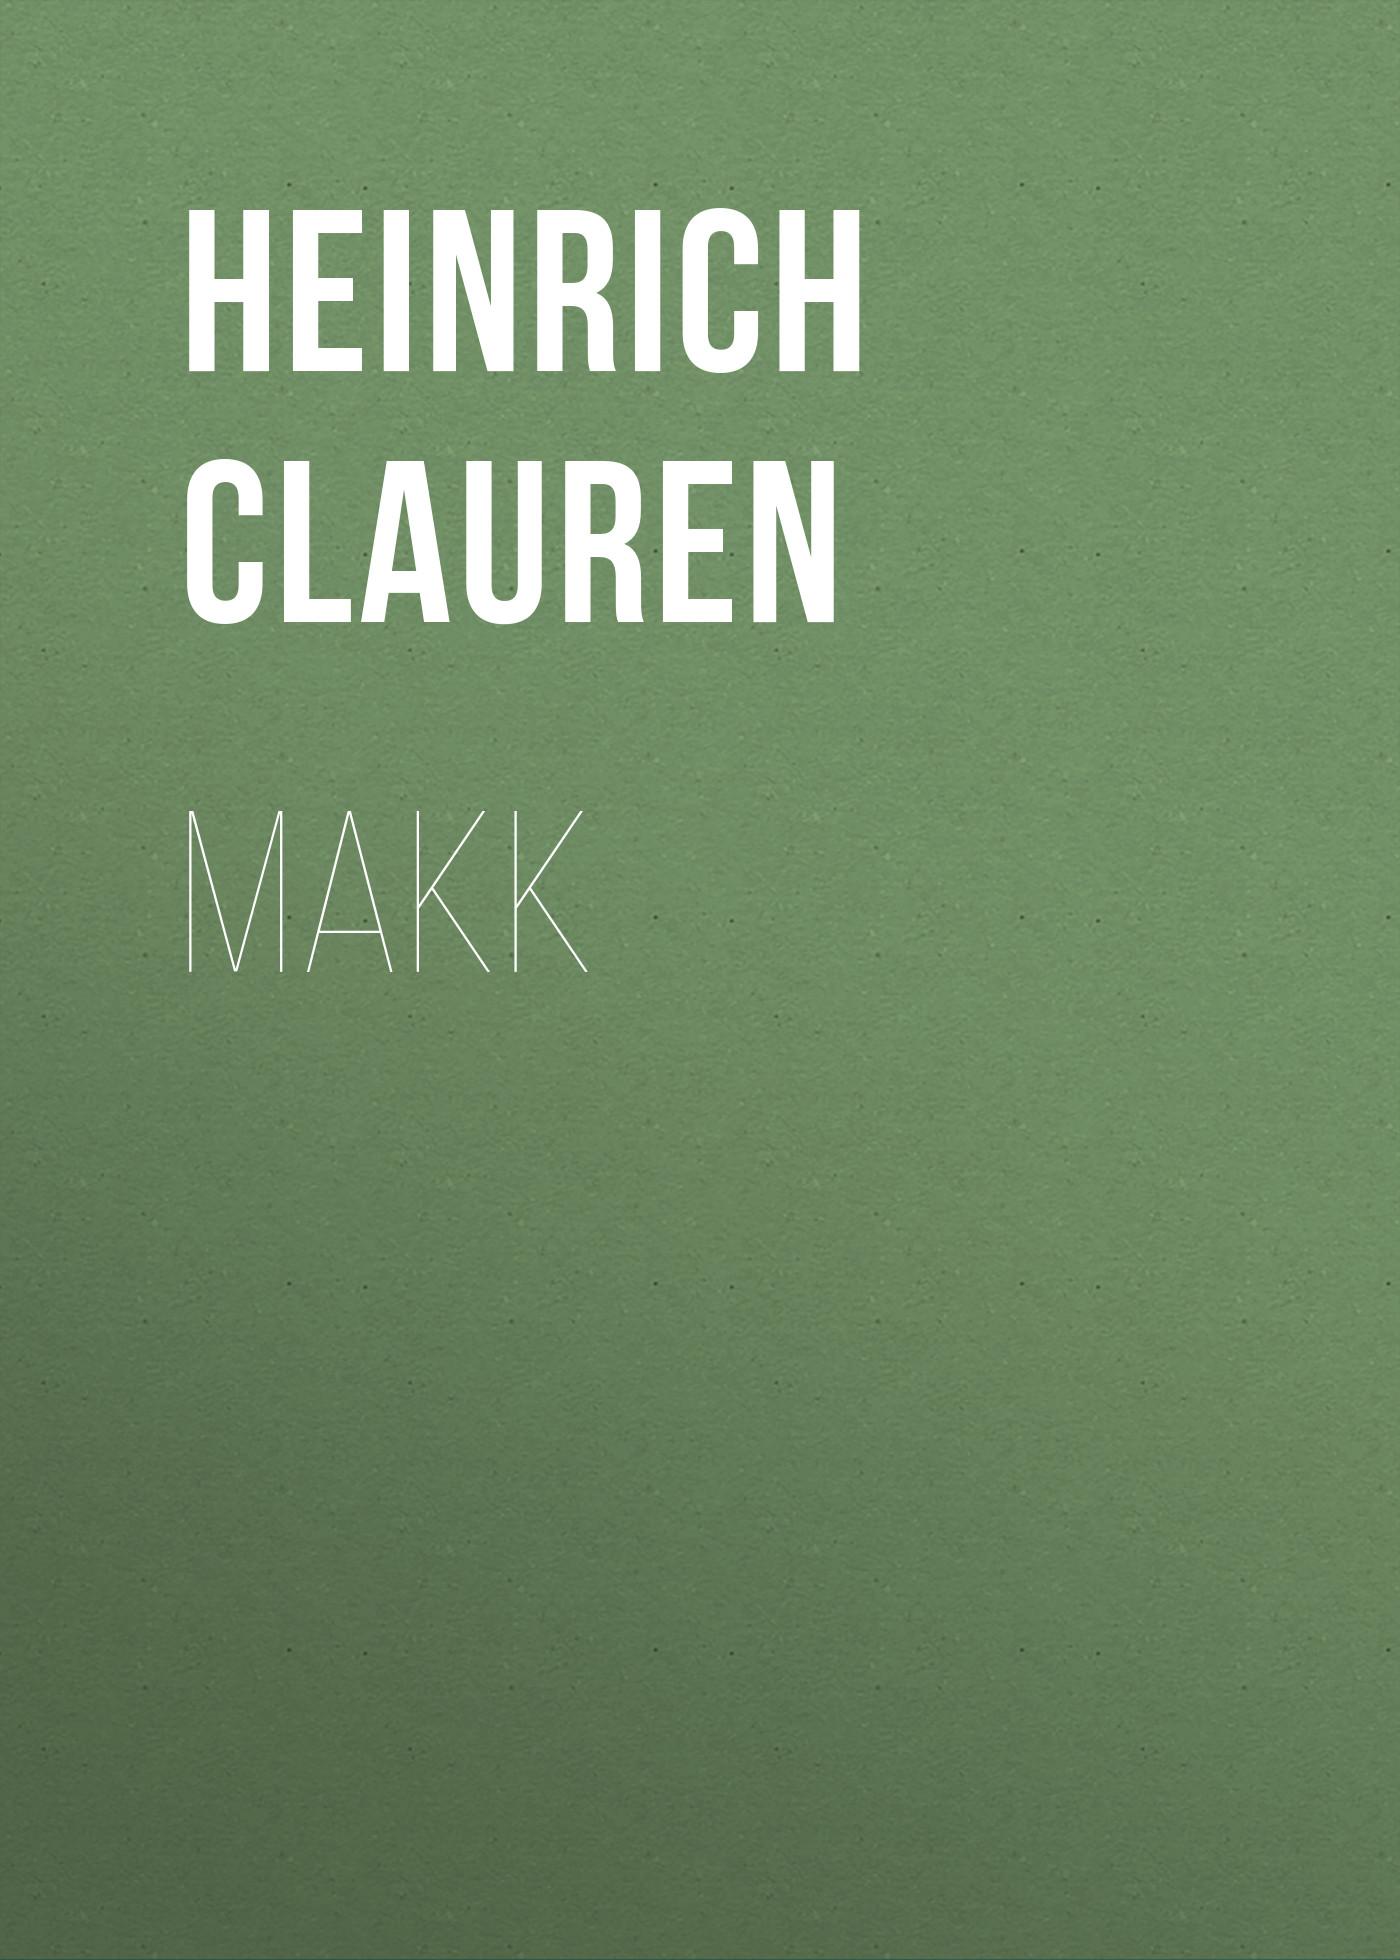 Heinrich Clauren Makk оснастка морская sft gummi makk colored